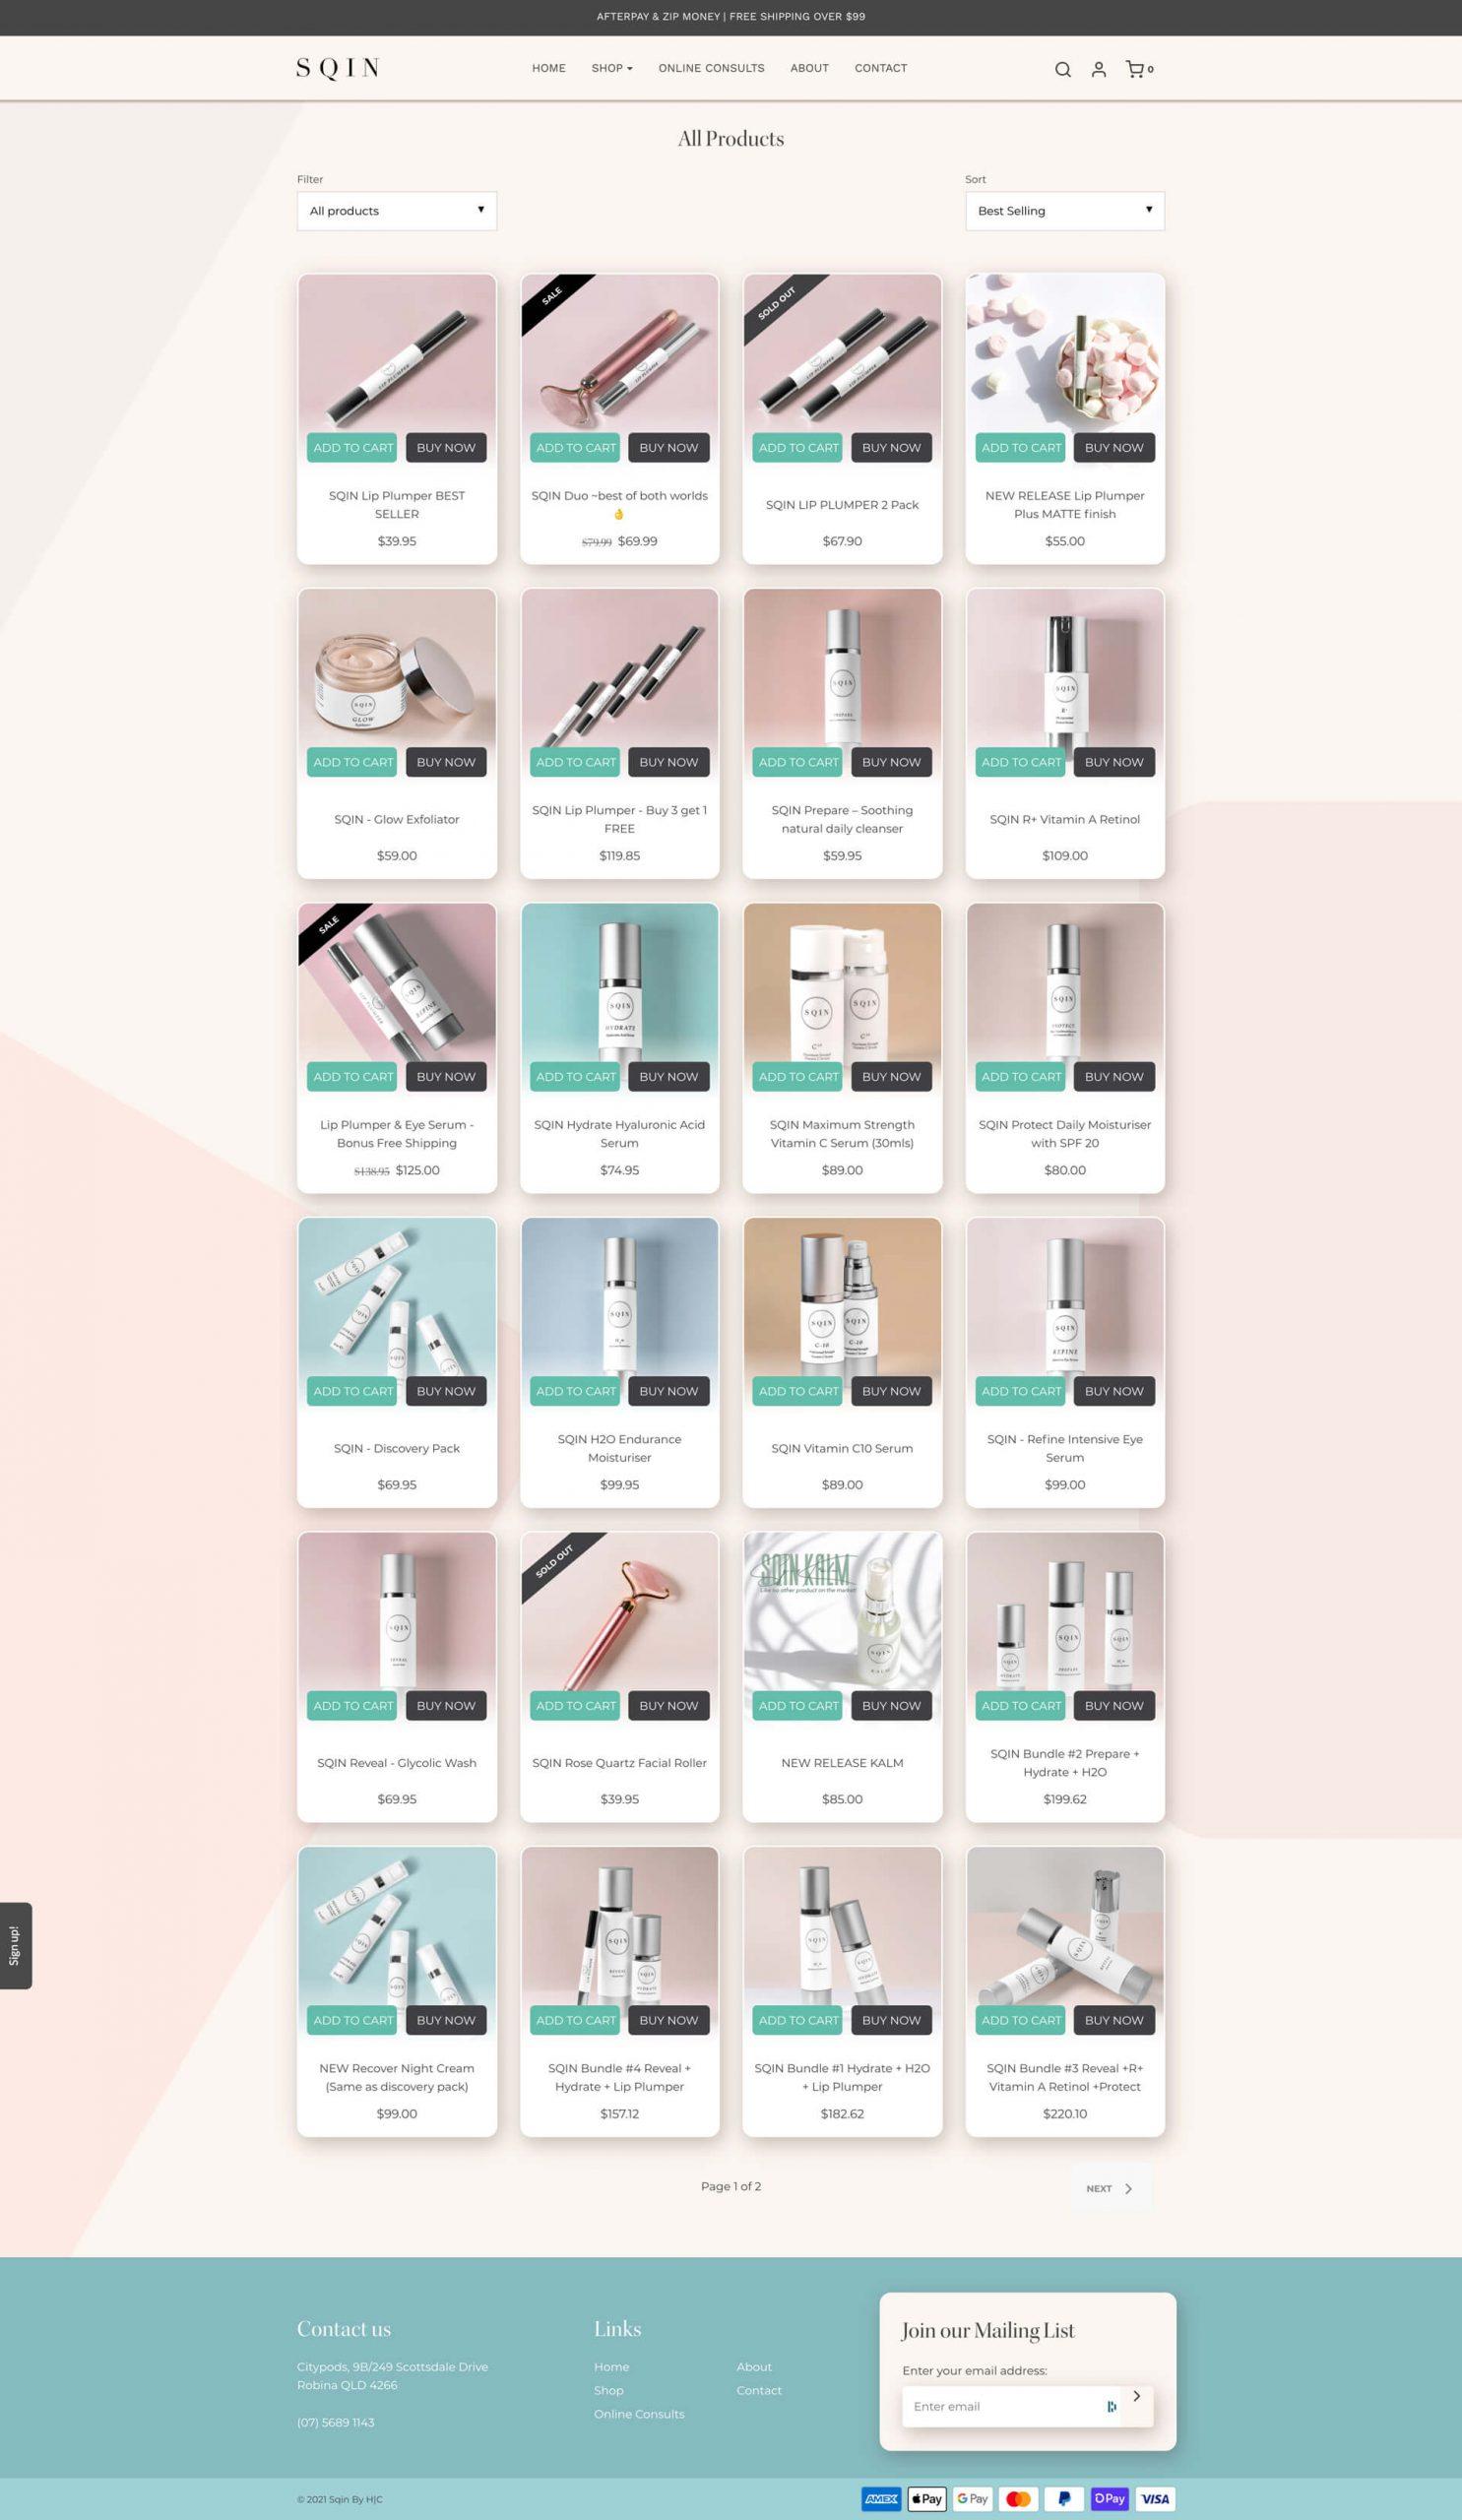 SQIN - Product Collection (Desktop)